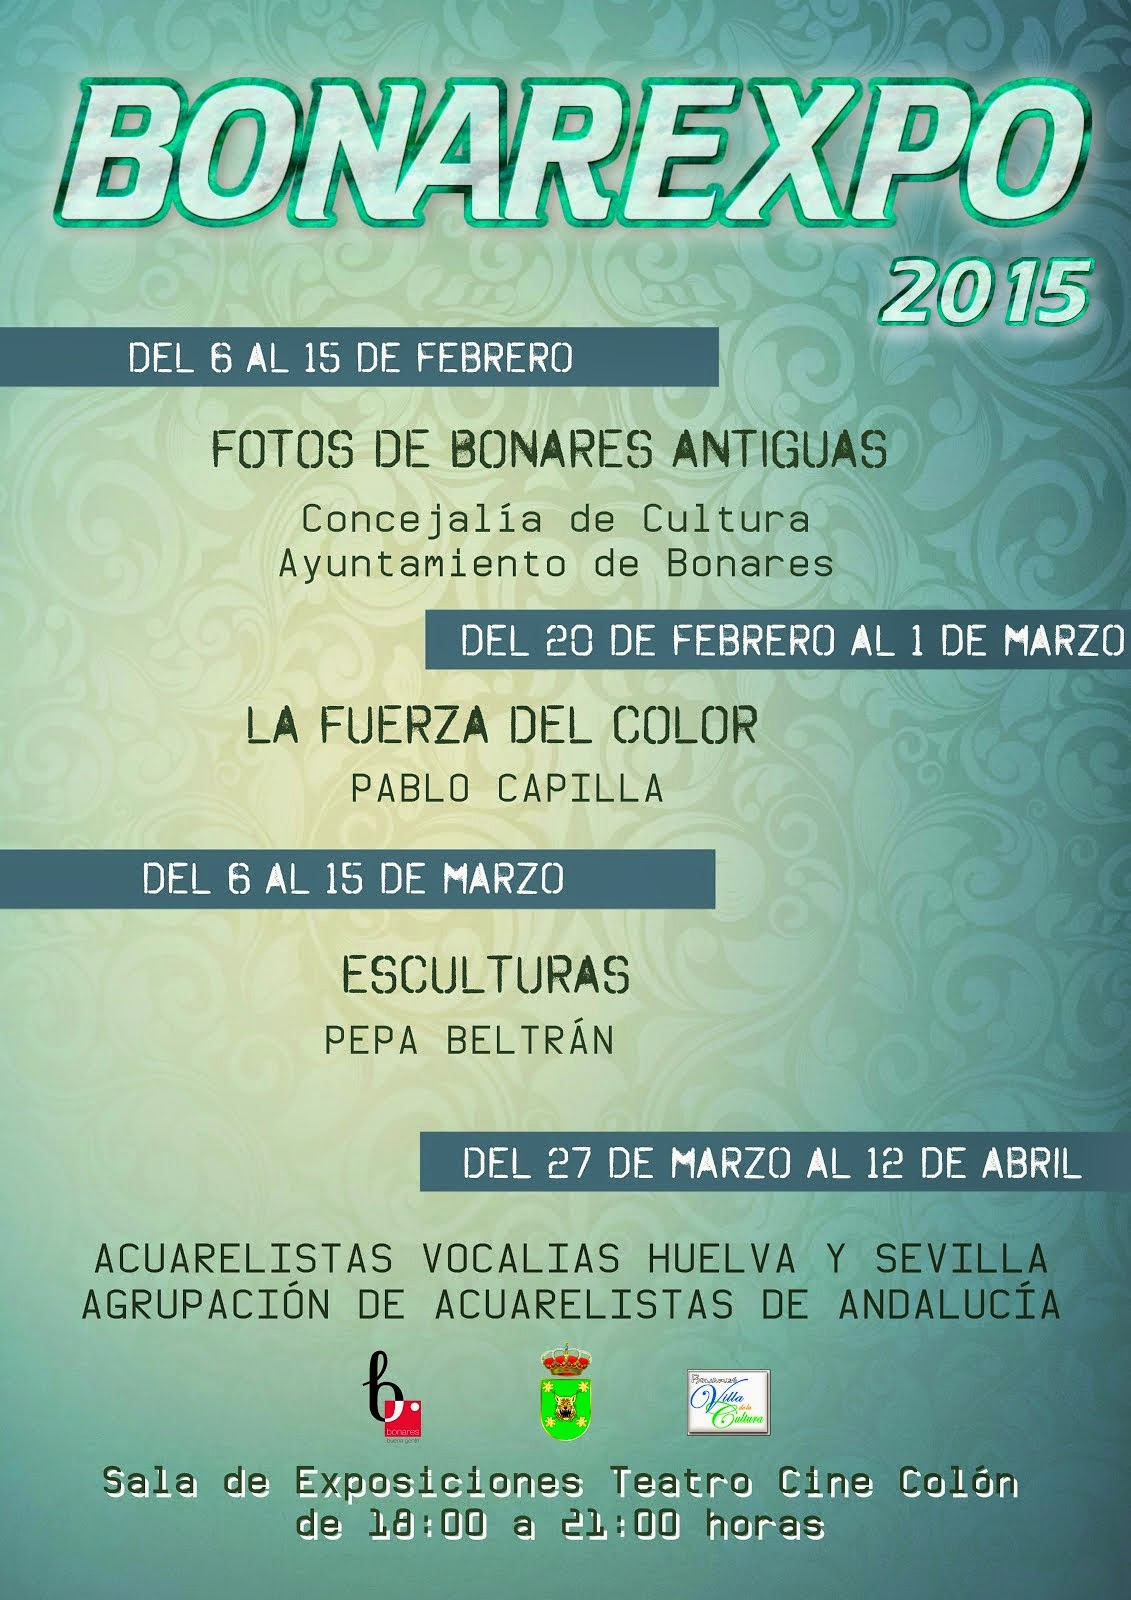 BONAREXPO 2015